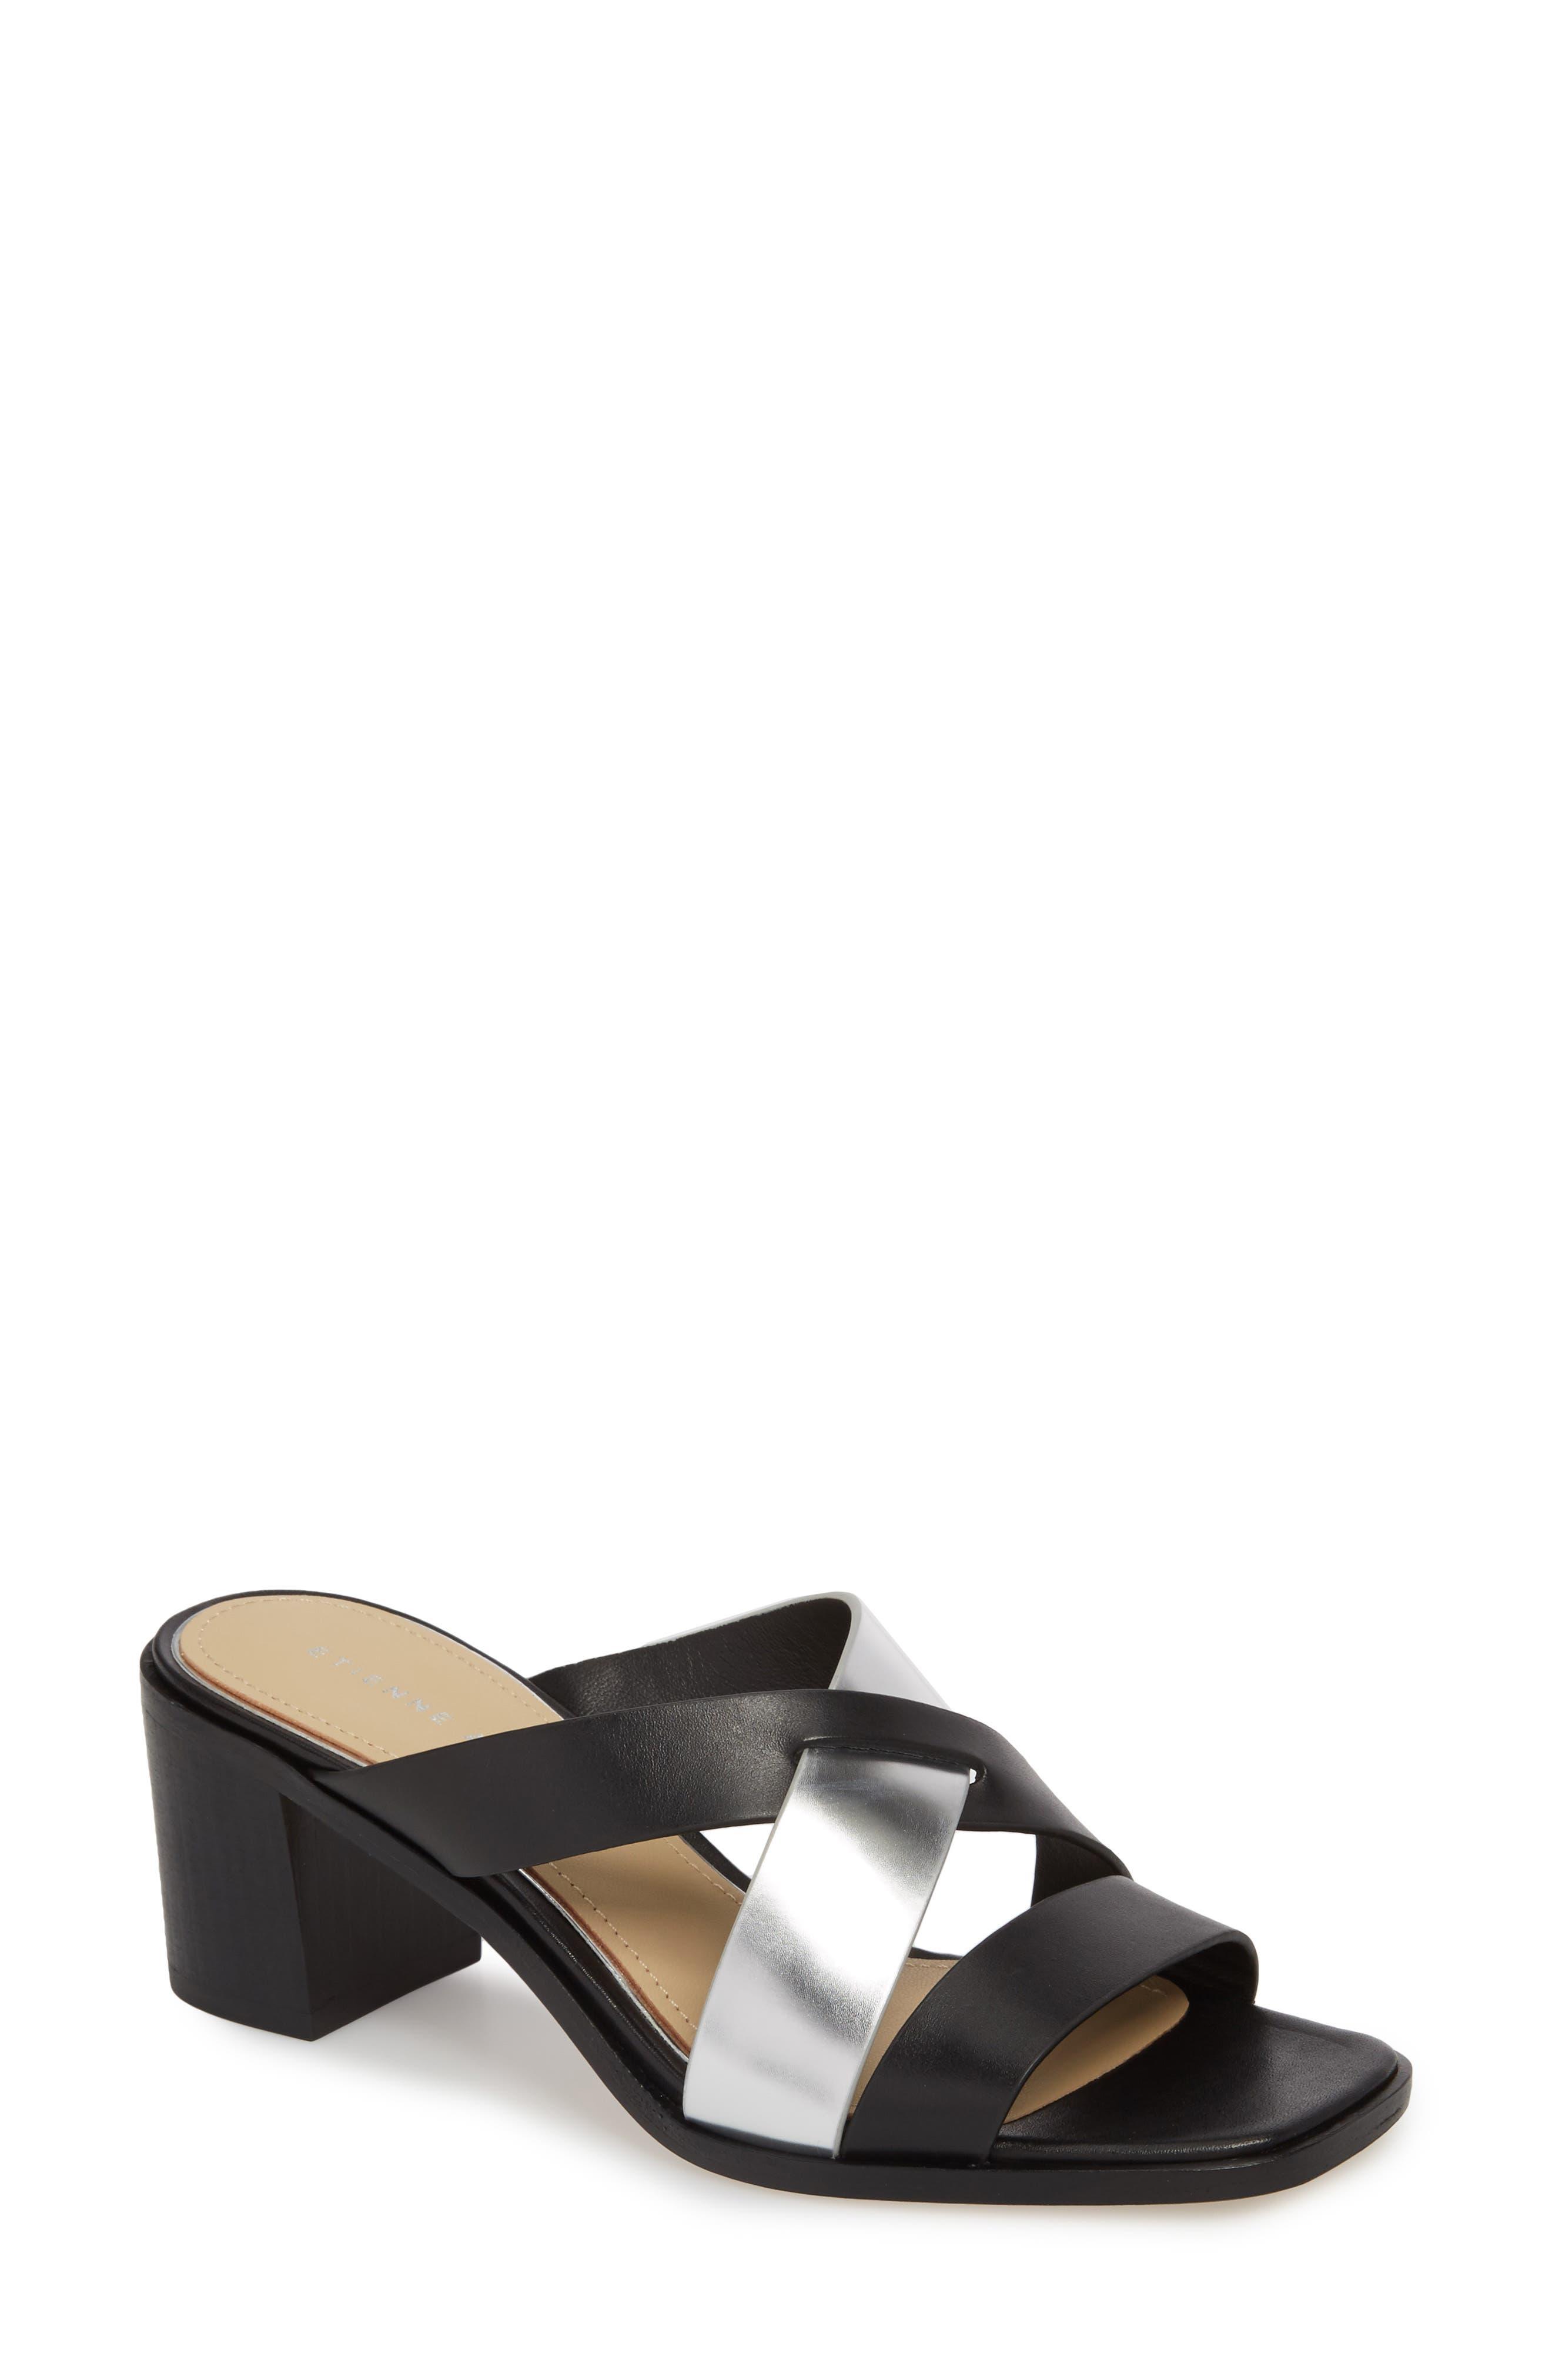 Negroni Cross Strap Mule Sandal,                         Main,                         color, BLACK/ SILVER LEATHER